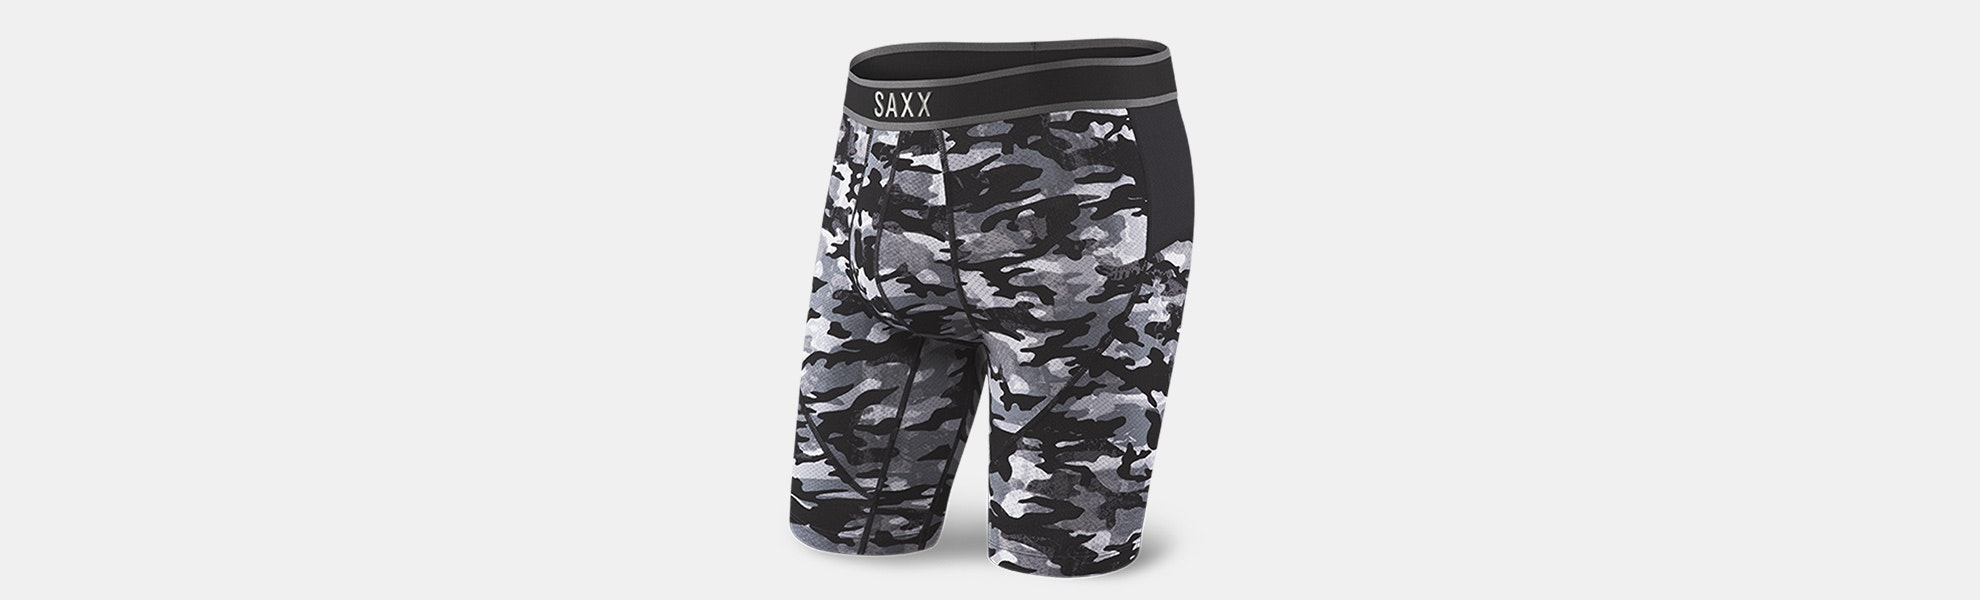 Closeout: SAXX Kinetic Long-Leg Boxer Brief & Tight